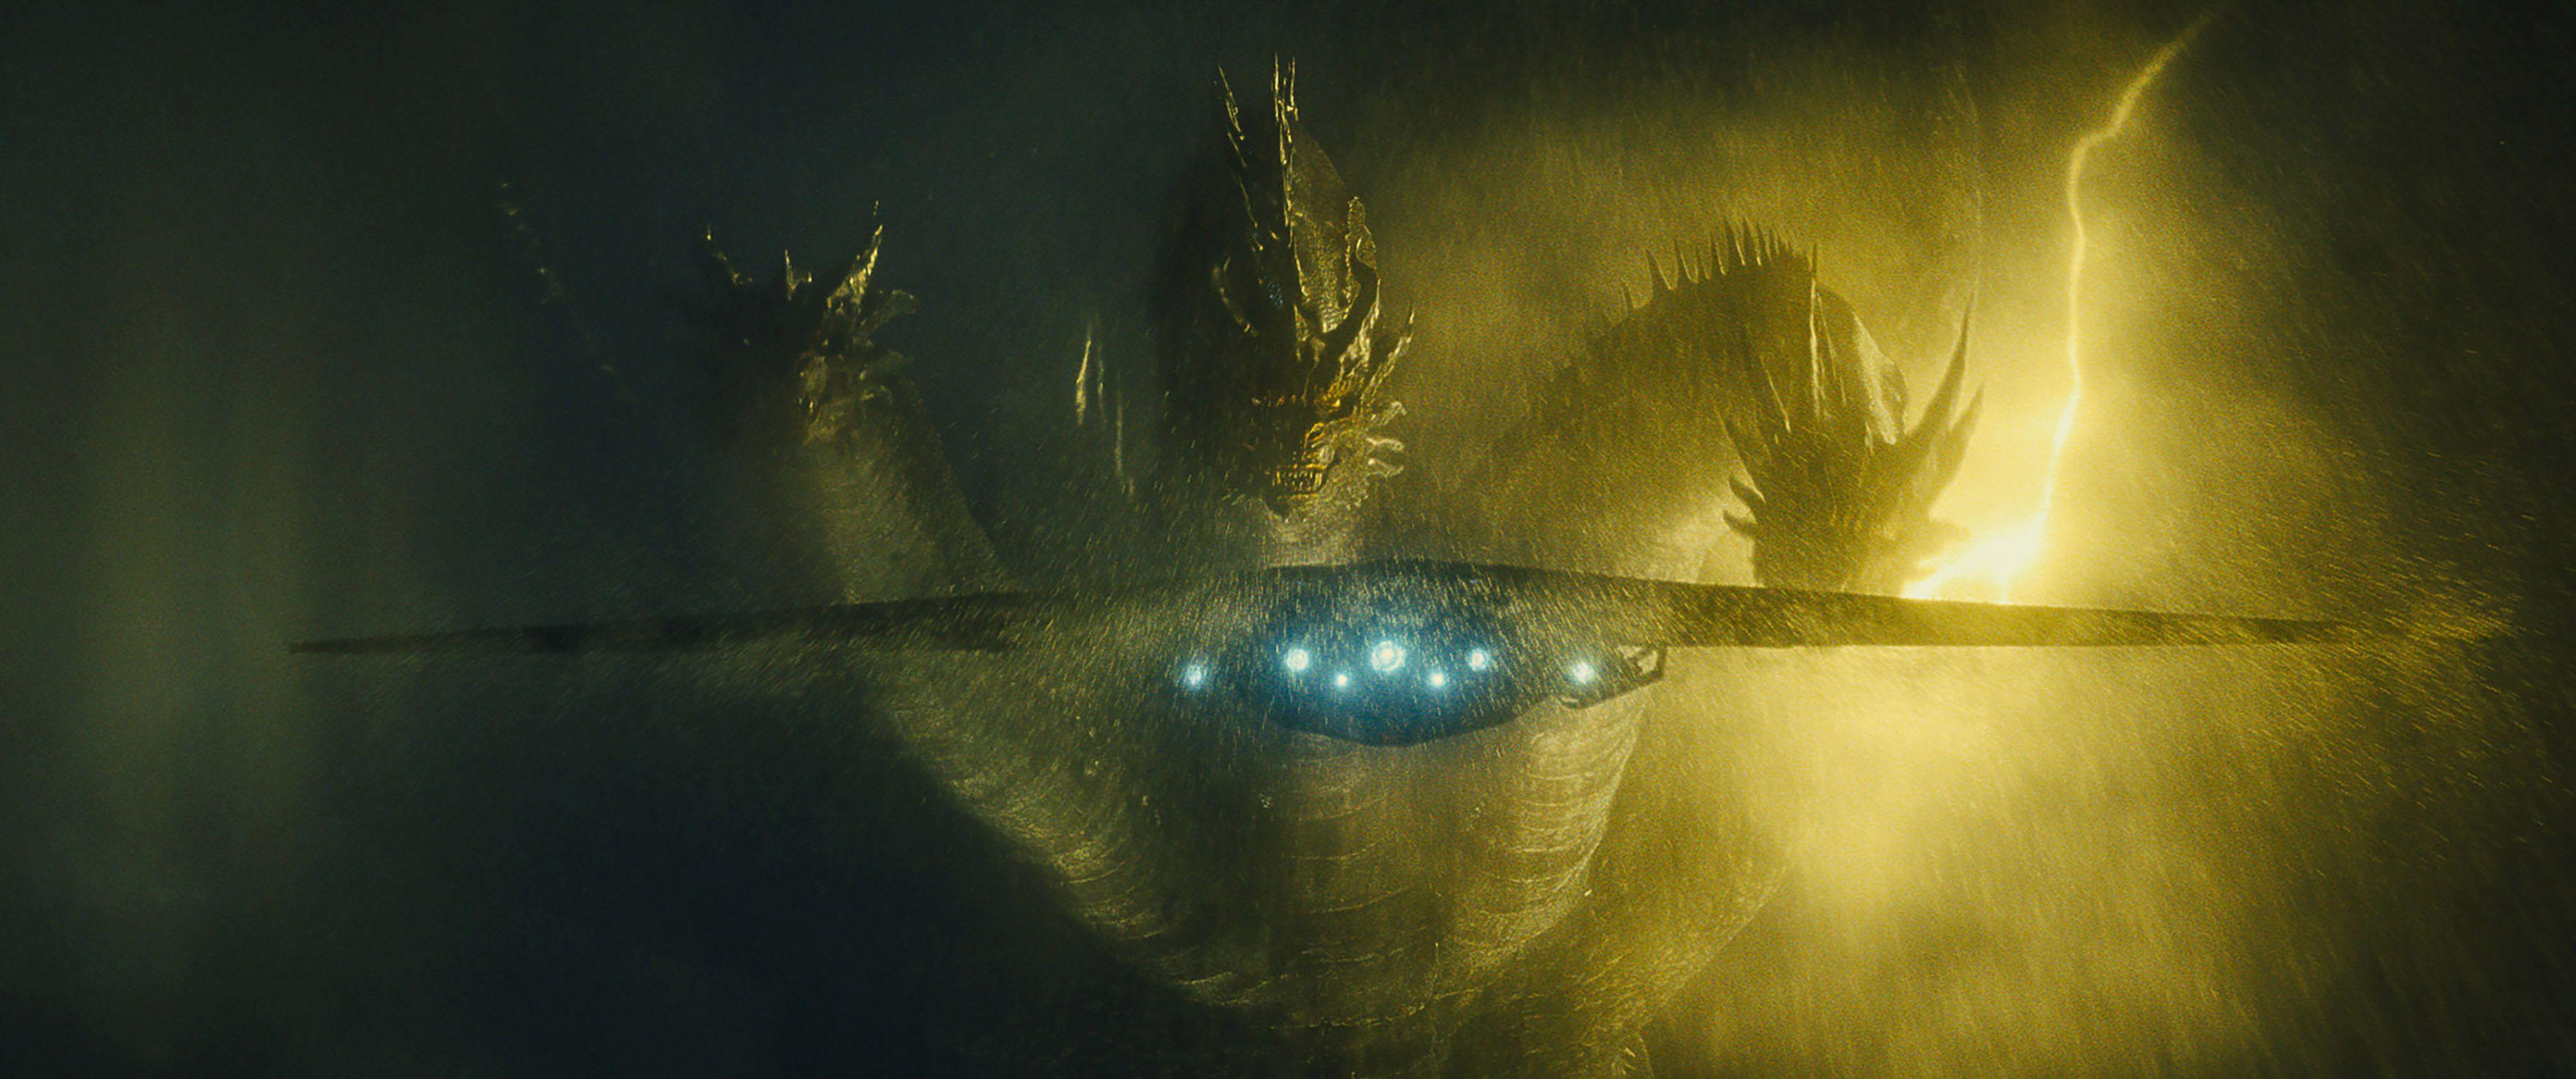 ghidorah-godzilla-king-monsters-hr.jpg